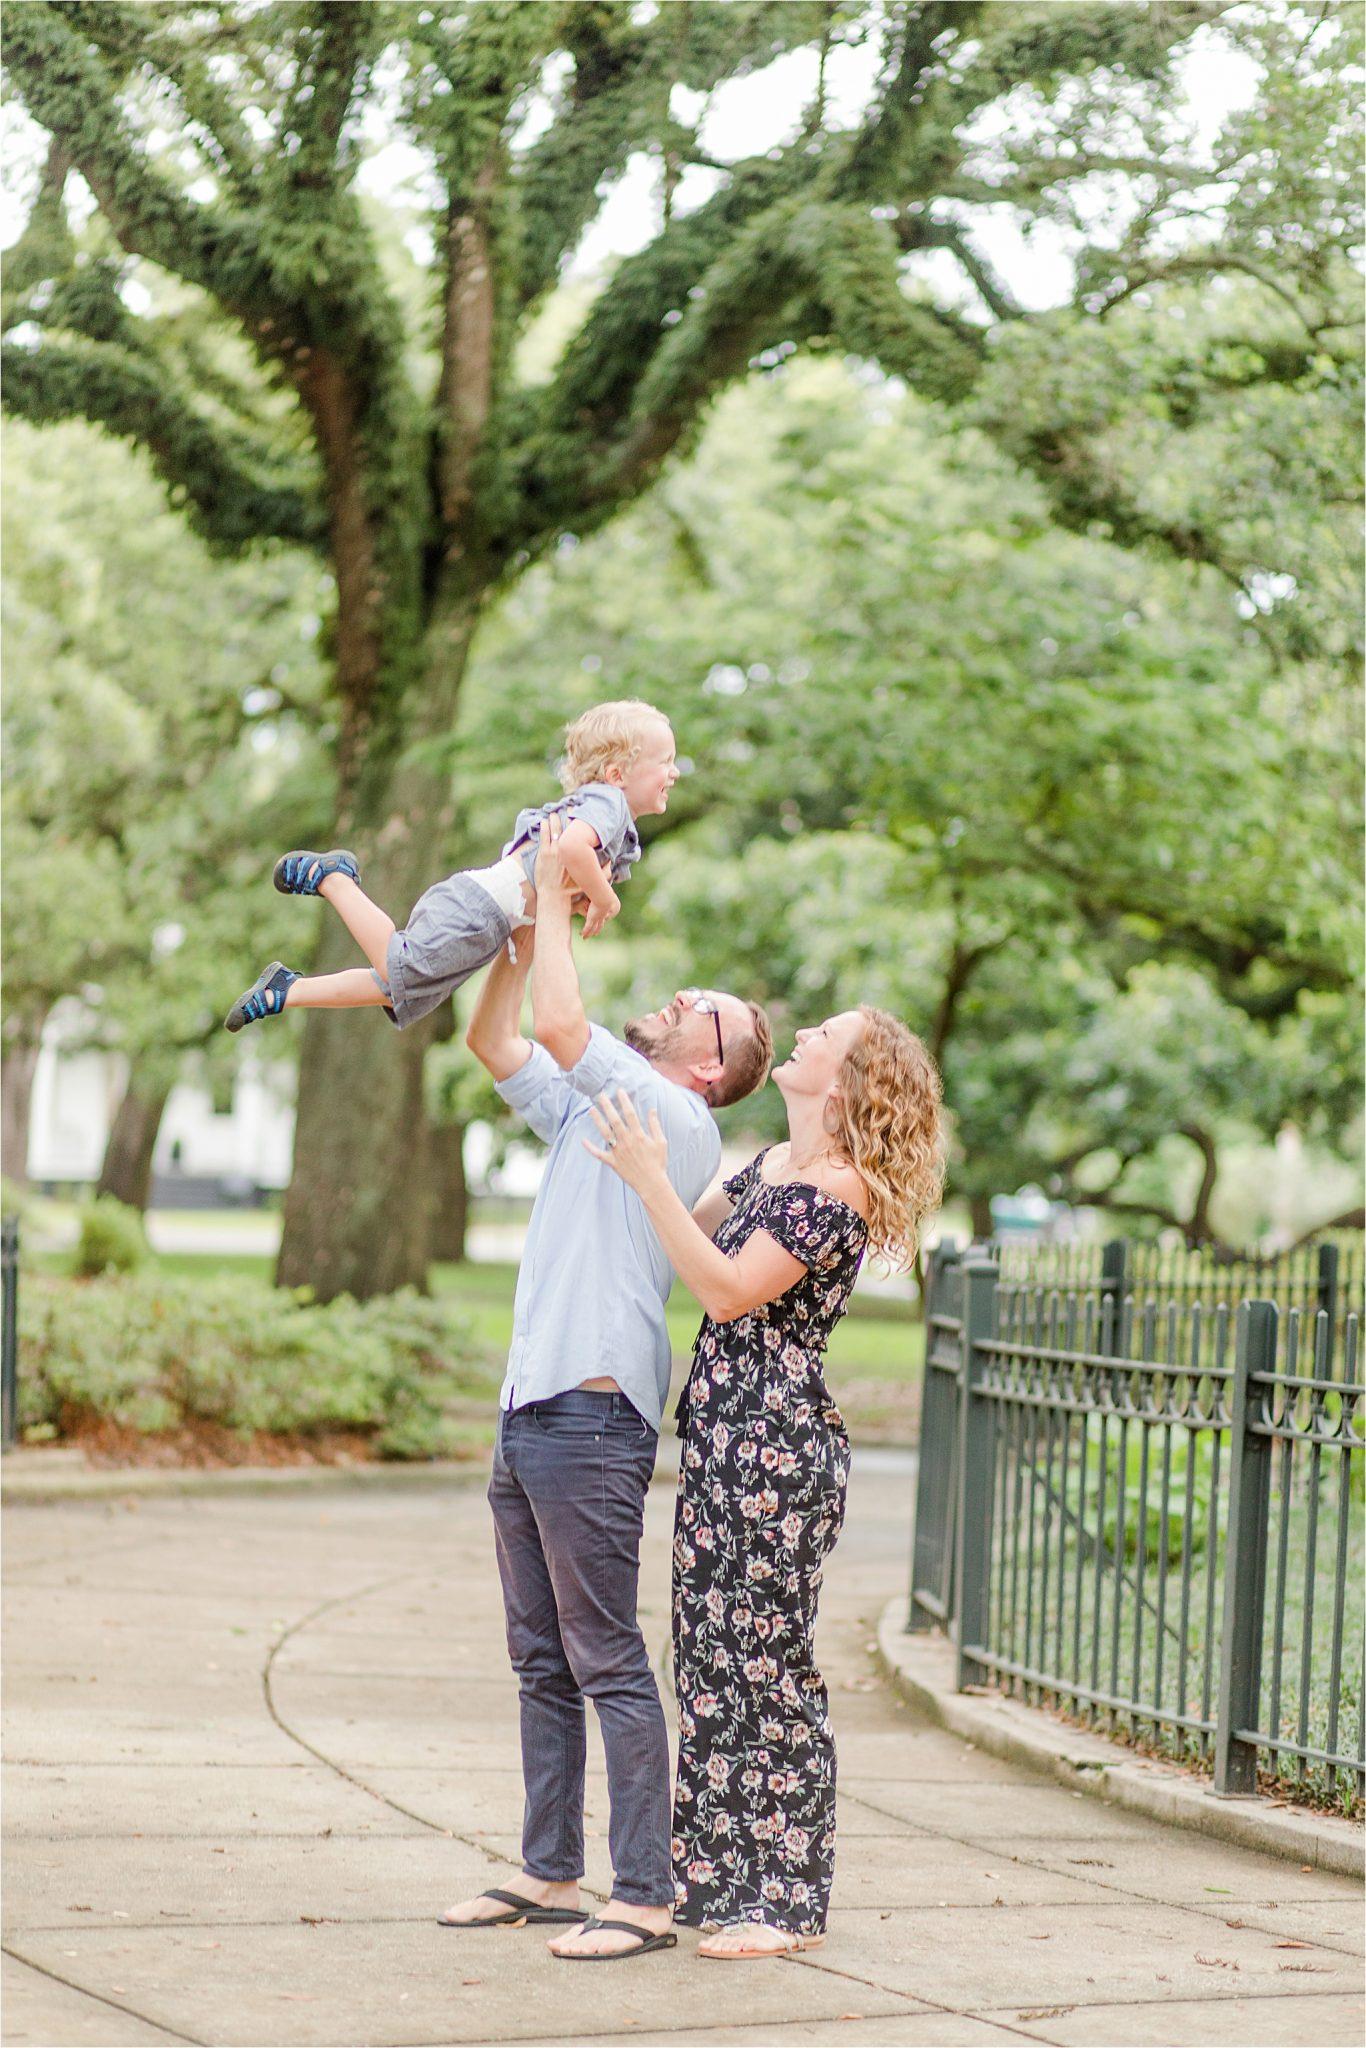 Washington Square Park Family Photography-Alabama family photographer-family of three-best Alabama family portrait locations-family photos